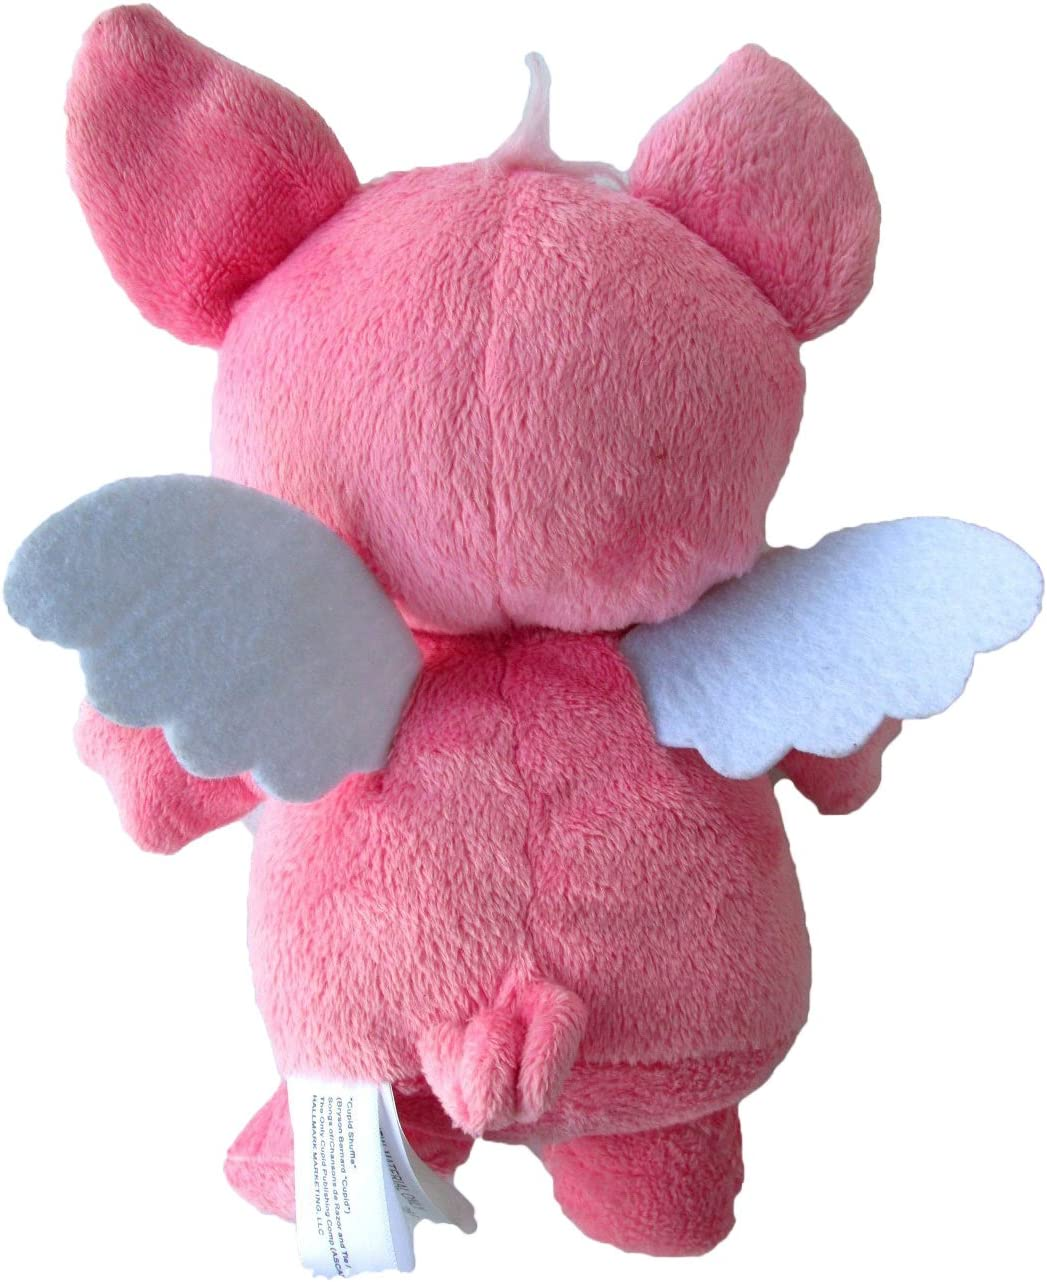 LPR4000 Cupig Hallmark Valentiness Day Techno Plush